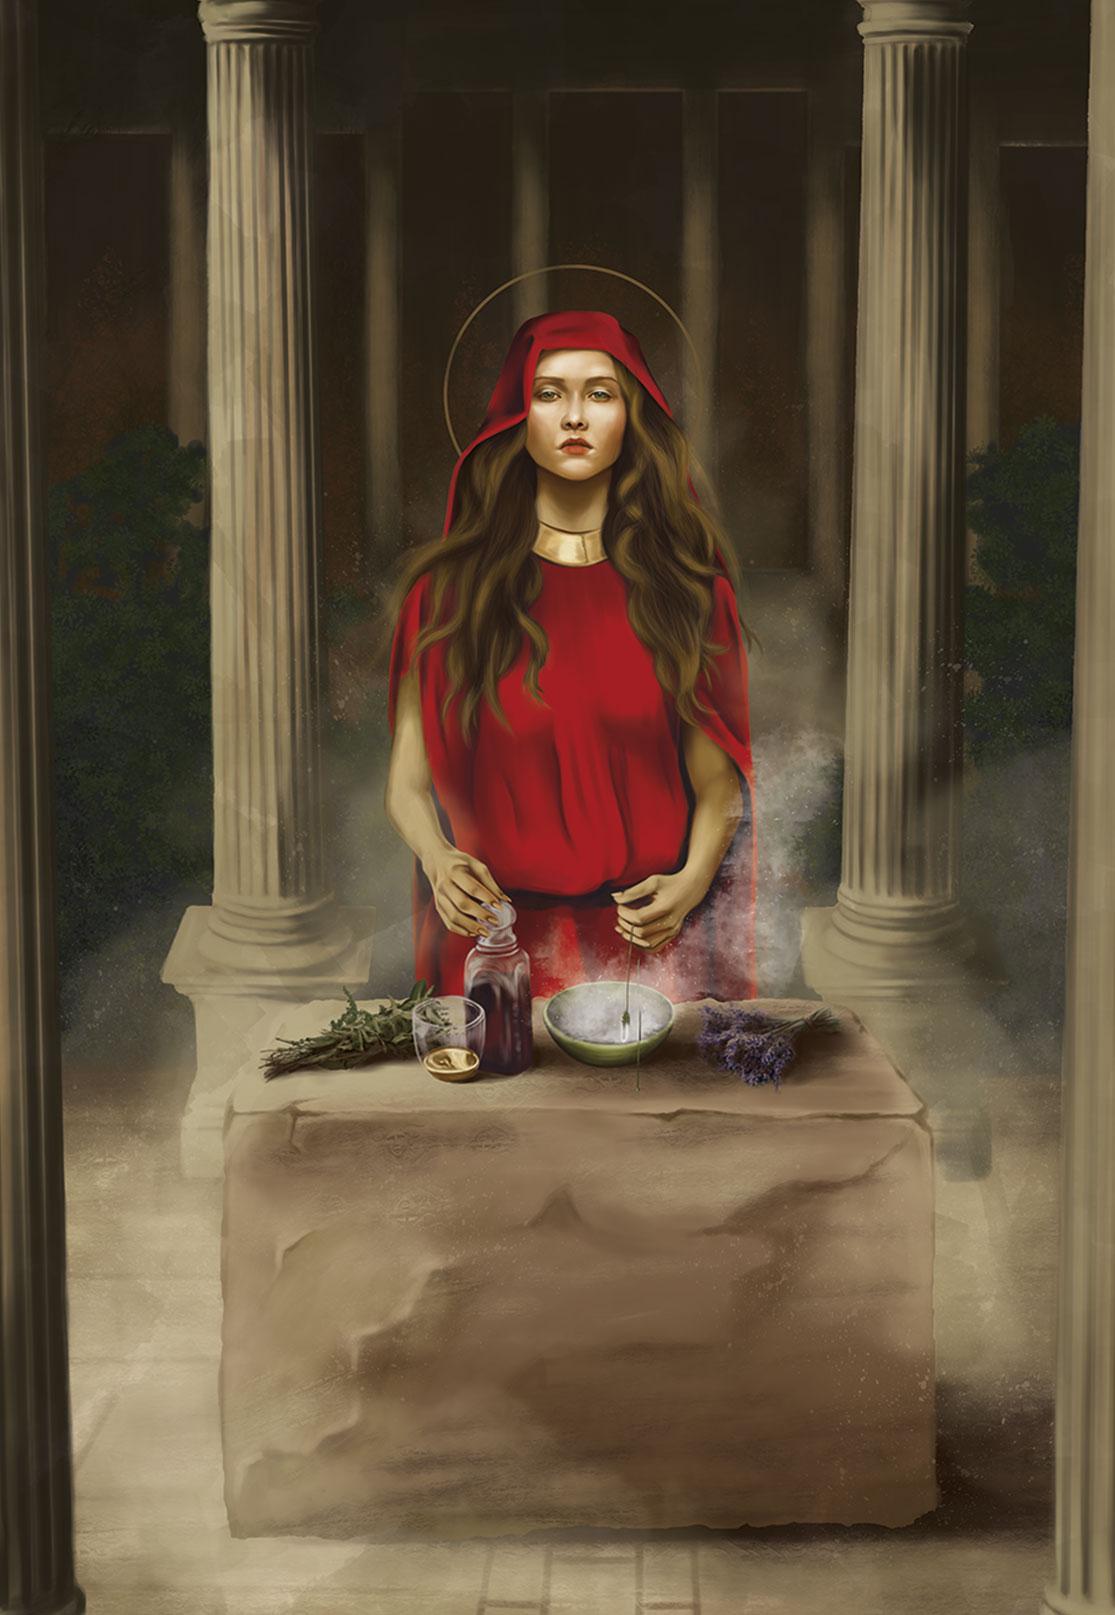 A modern take on Mary Magdalene